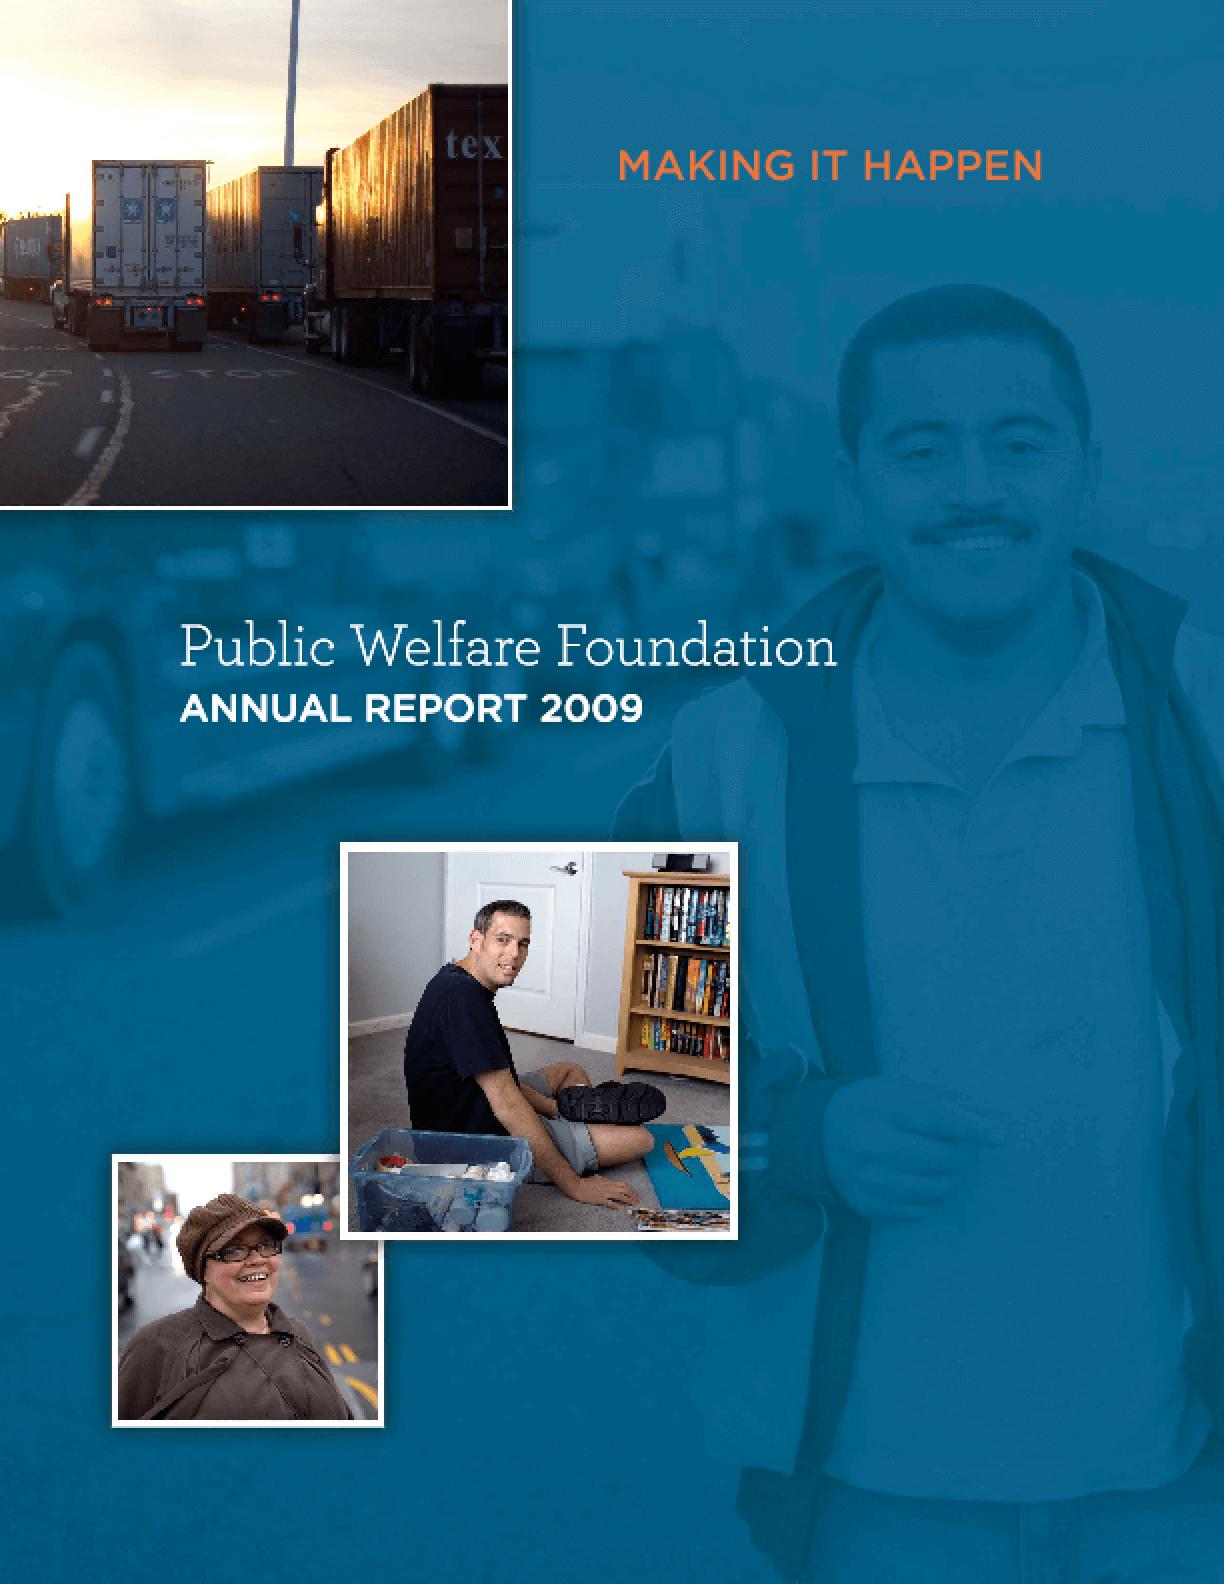 Public Welfare Foundation - 2009 Annual Report: Making It Happen